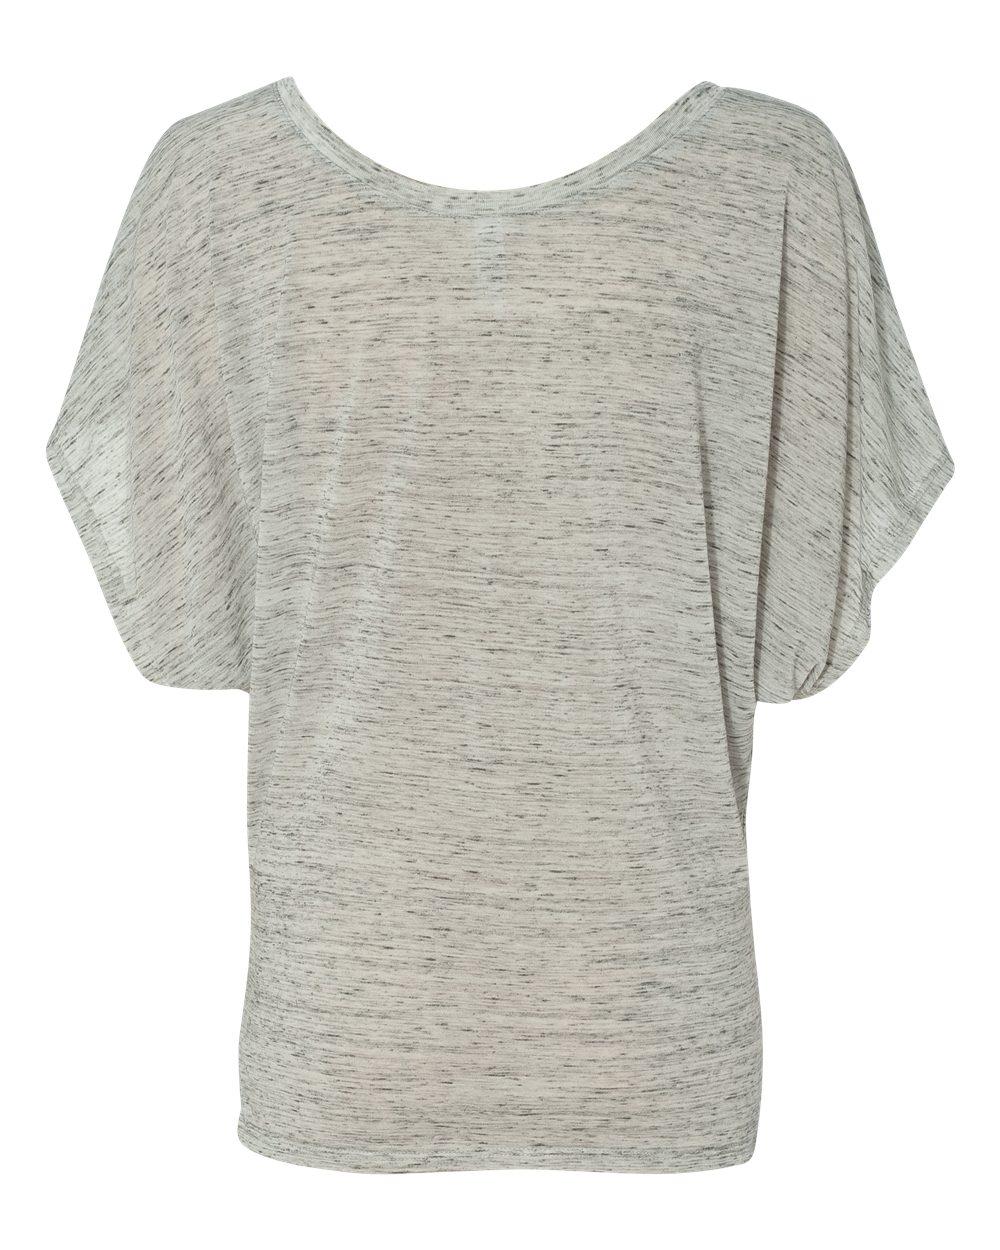 Bella-Canvas-Women-039-s-Flowy-Draped-Sleeve-Dolman-T-Shirt-8821-S-2XL thumbnail 10